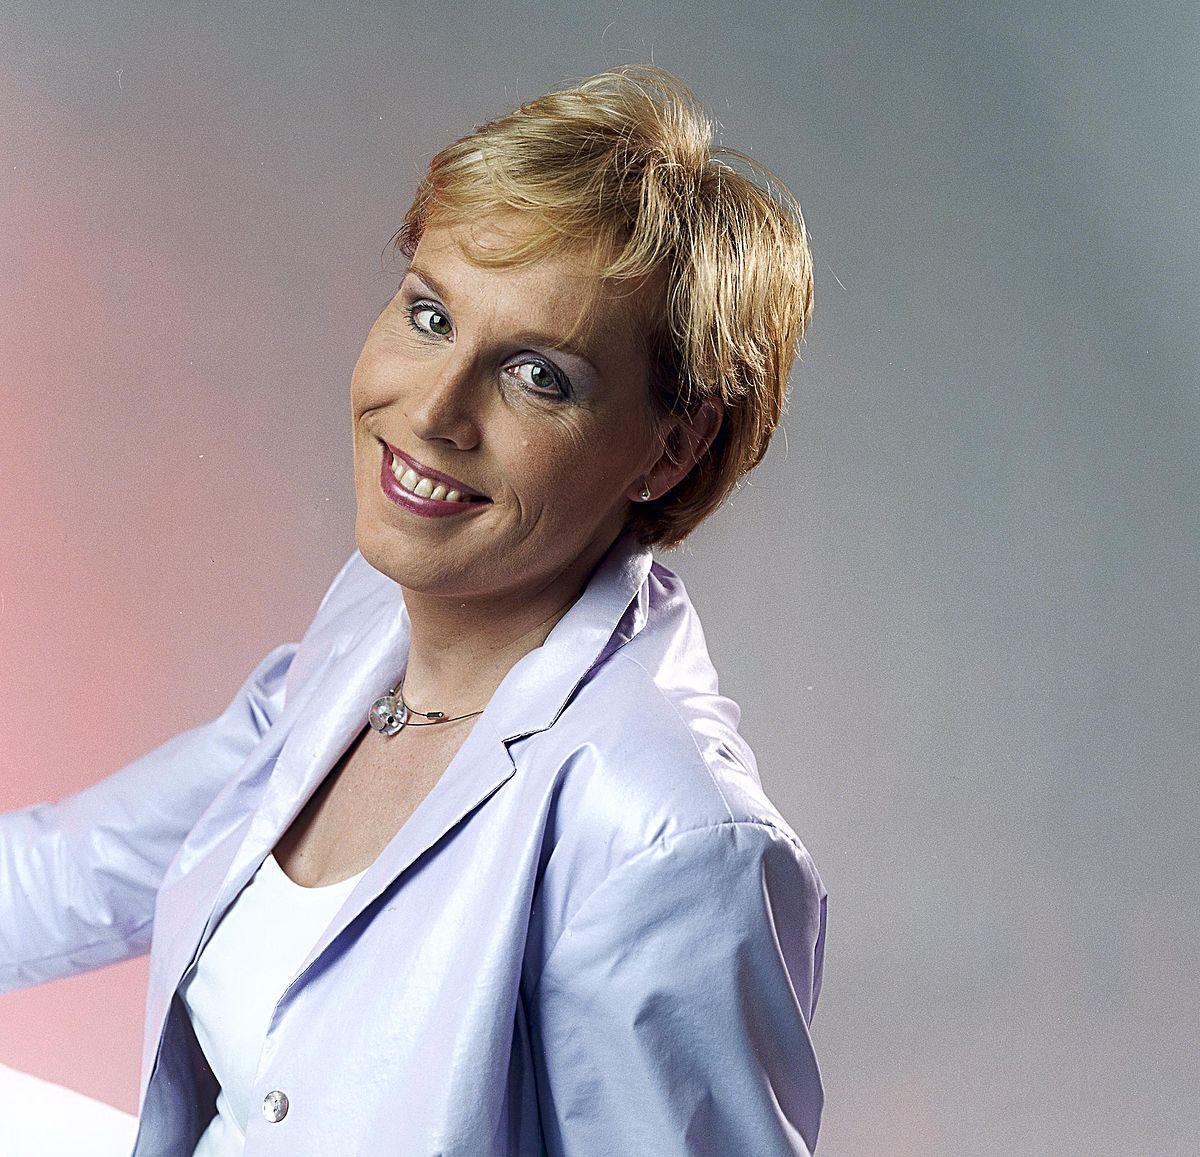 Barbara M. Veenman - Wikipedia